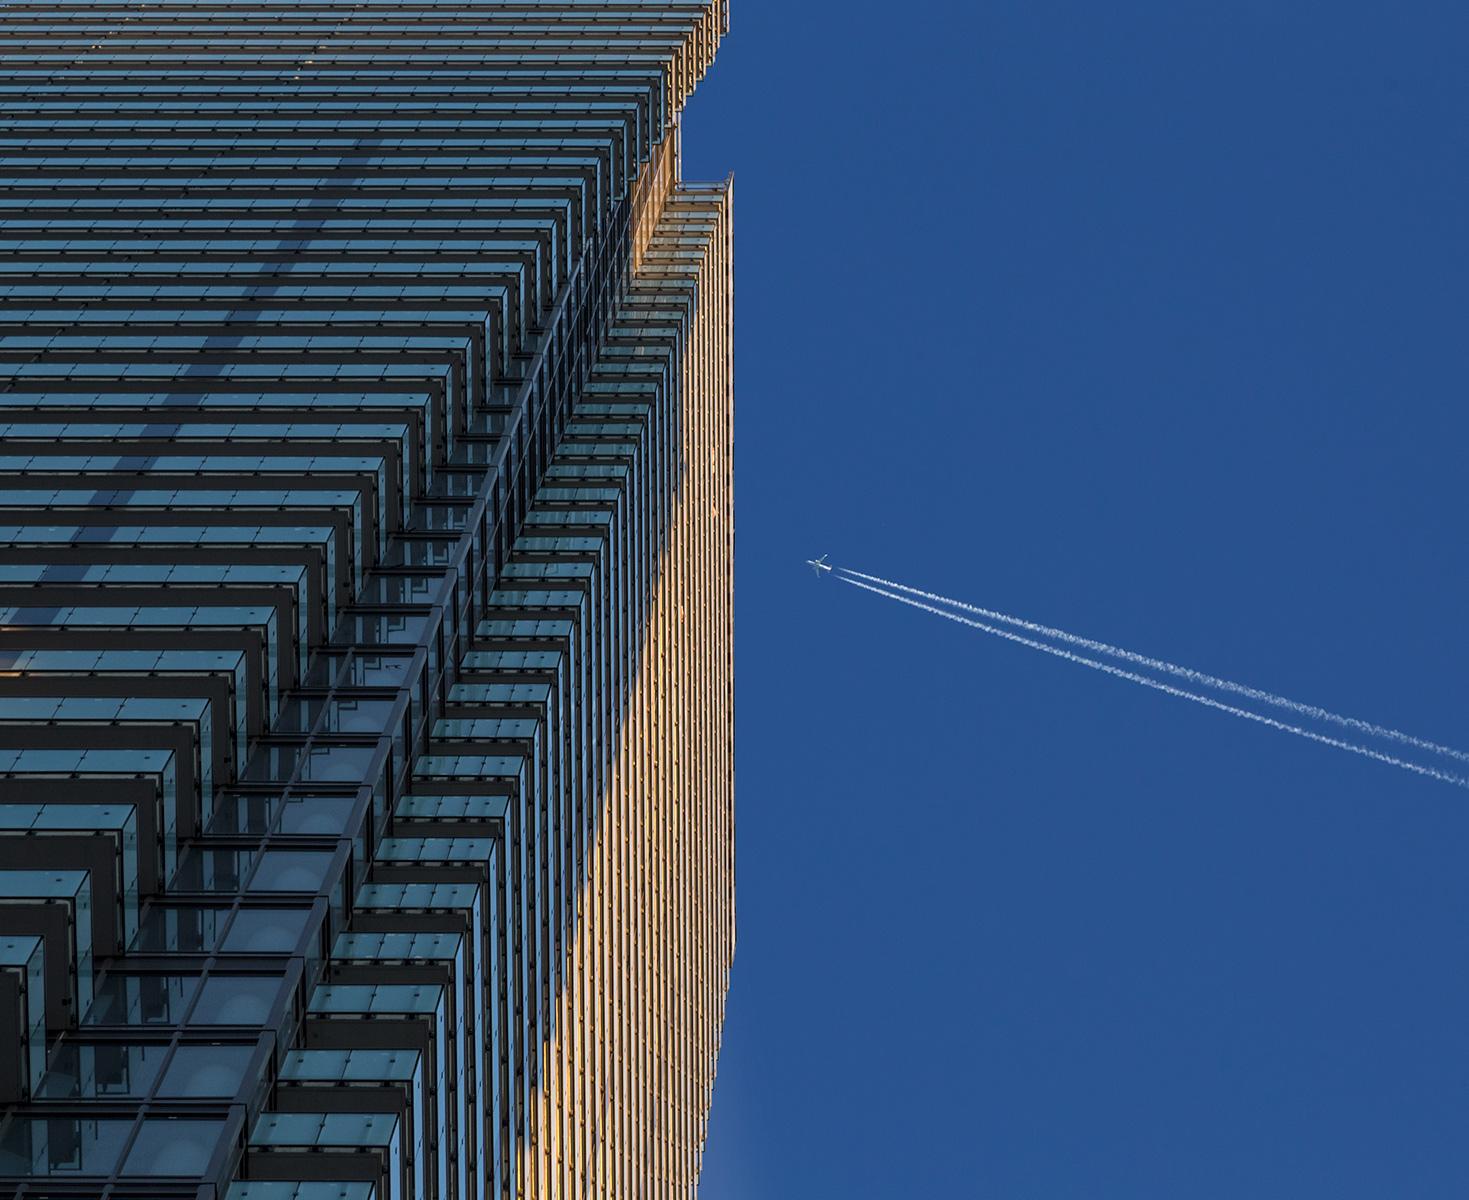 20151103. The U condominium skyscraper keeps another skyscraper